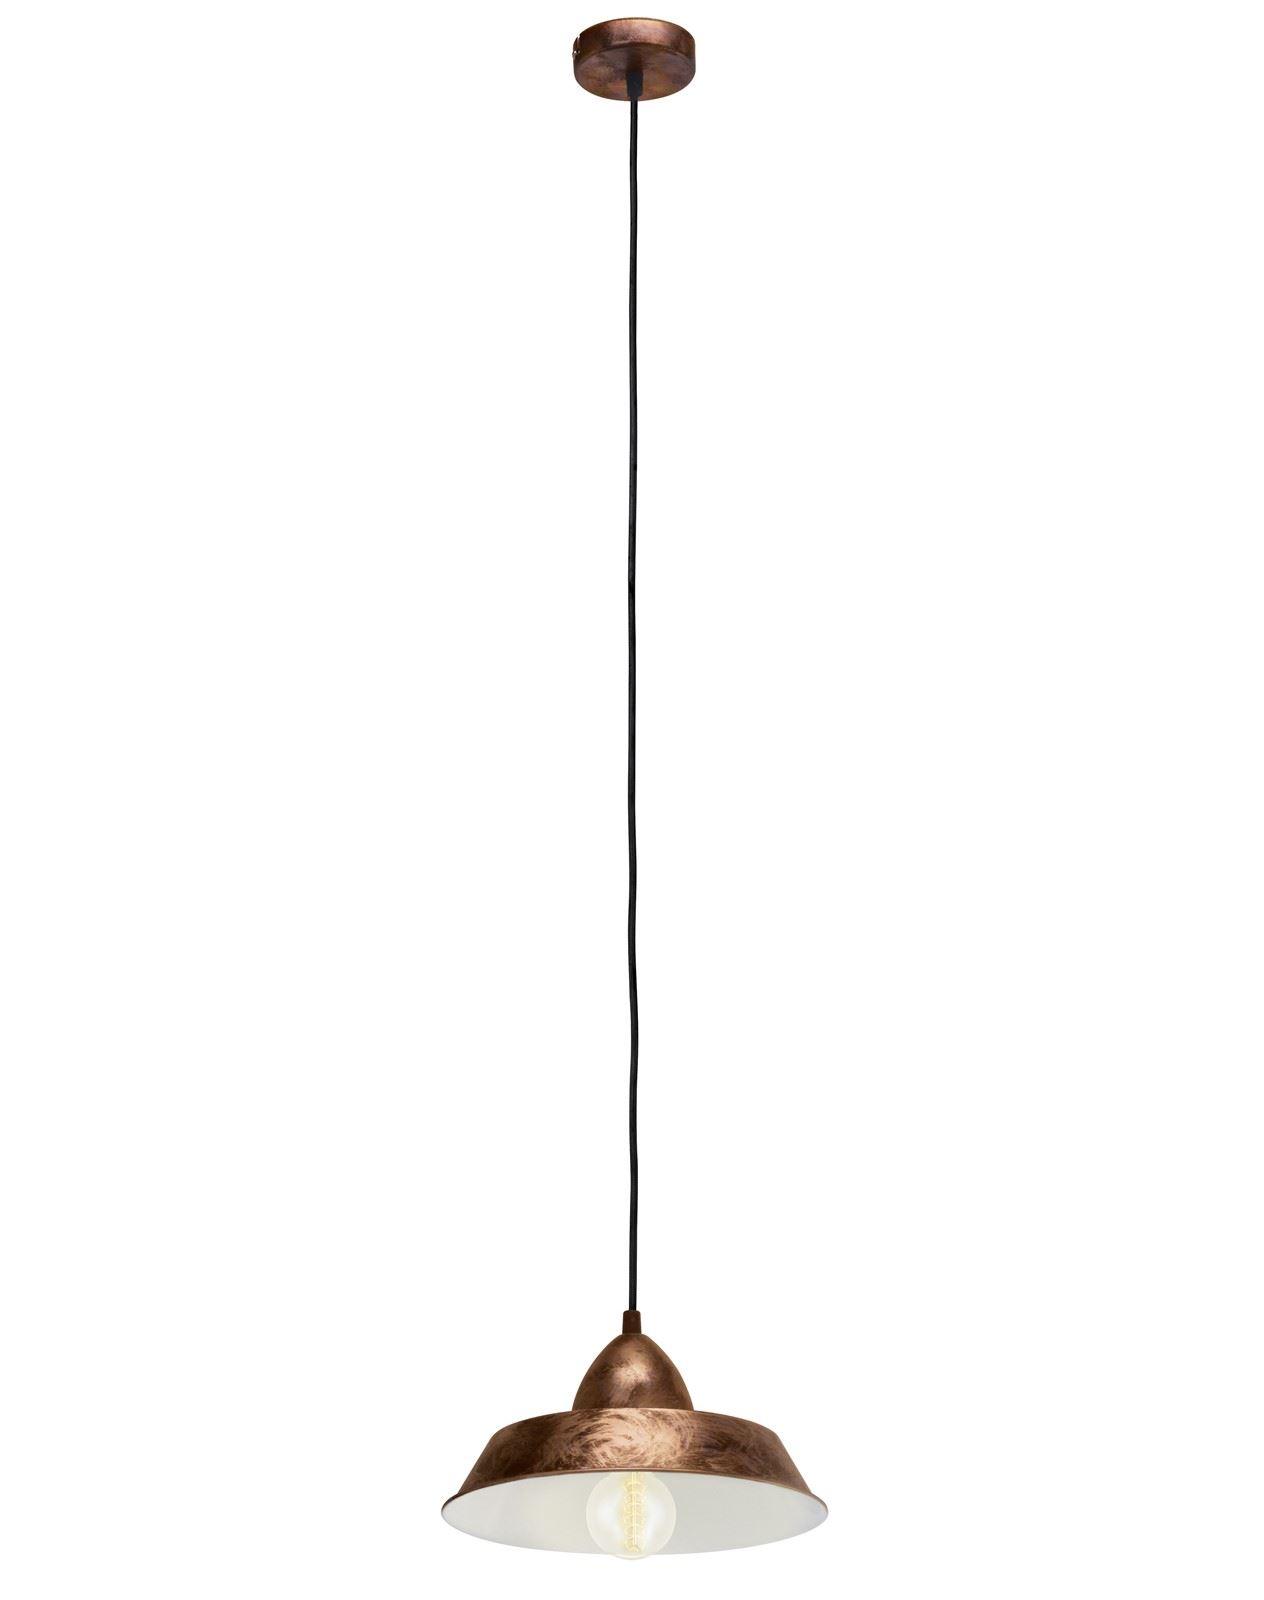 Auckland Hanging Pendant Light E27 Copper Antique